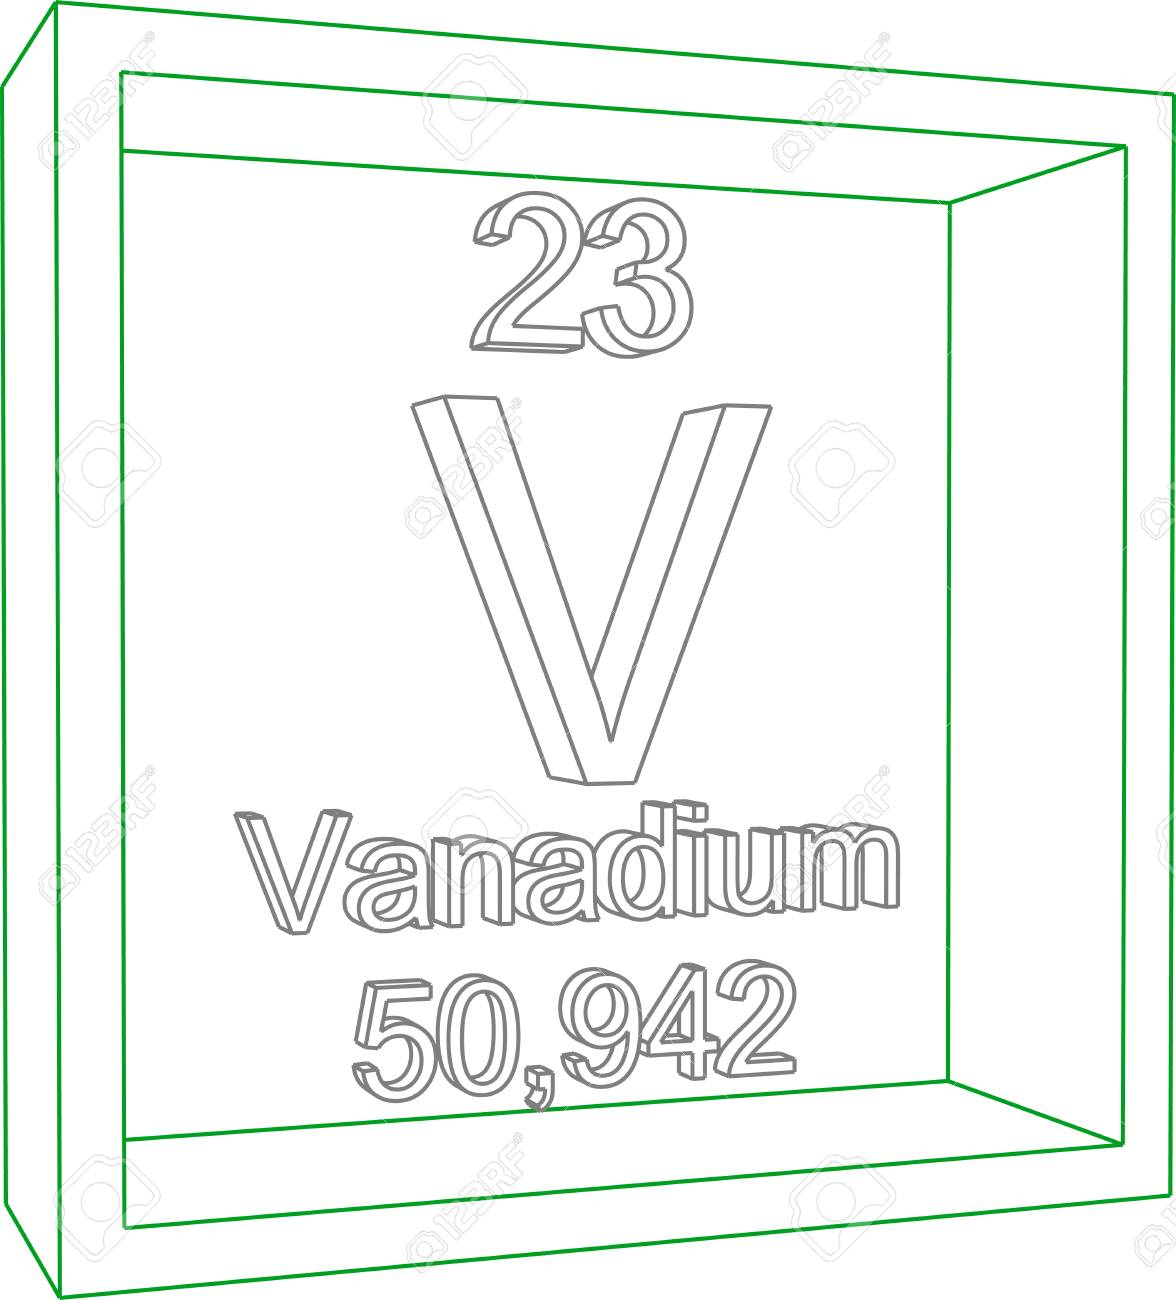 Periodic table of elements vanadium royalty free cliparts vectors periodic table of elements vanadium stock vector 57961373 urtaz Choice Image